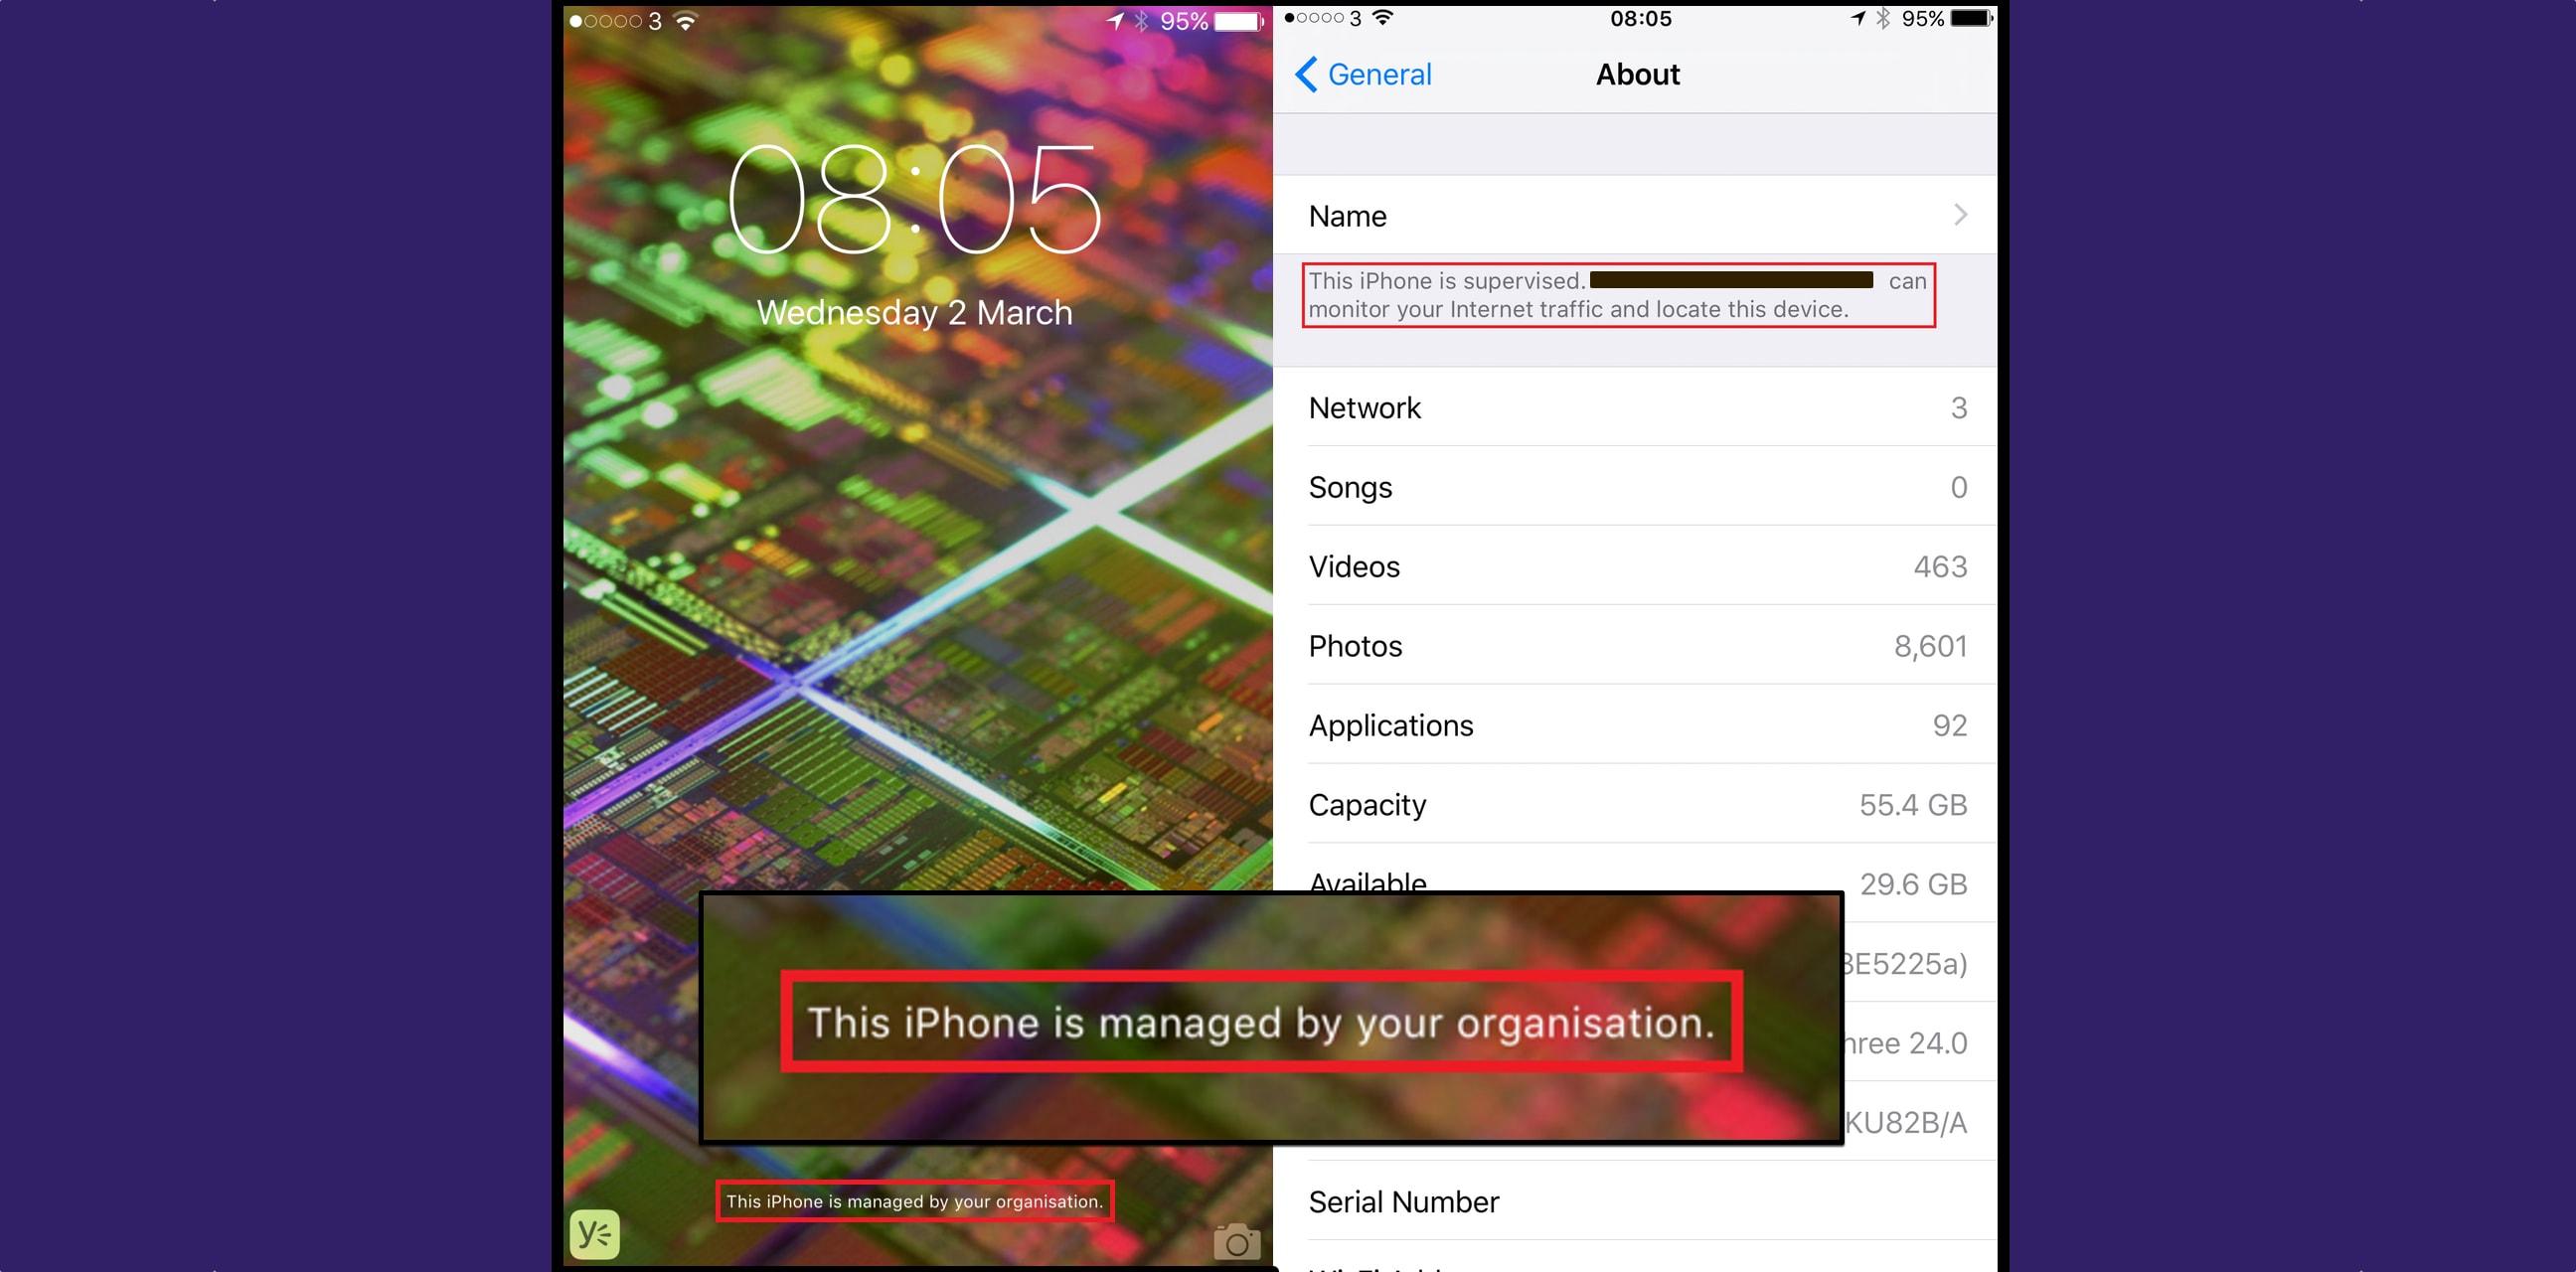 Aviso de monitoramento no iOS 9.3